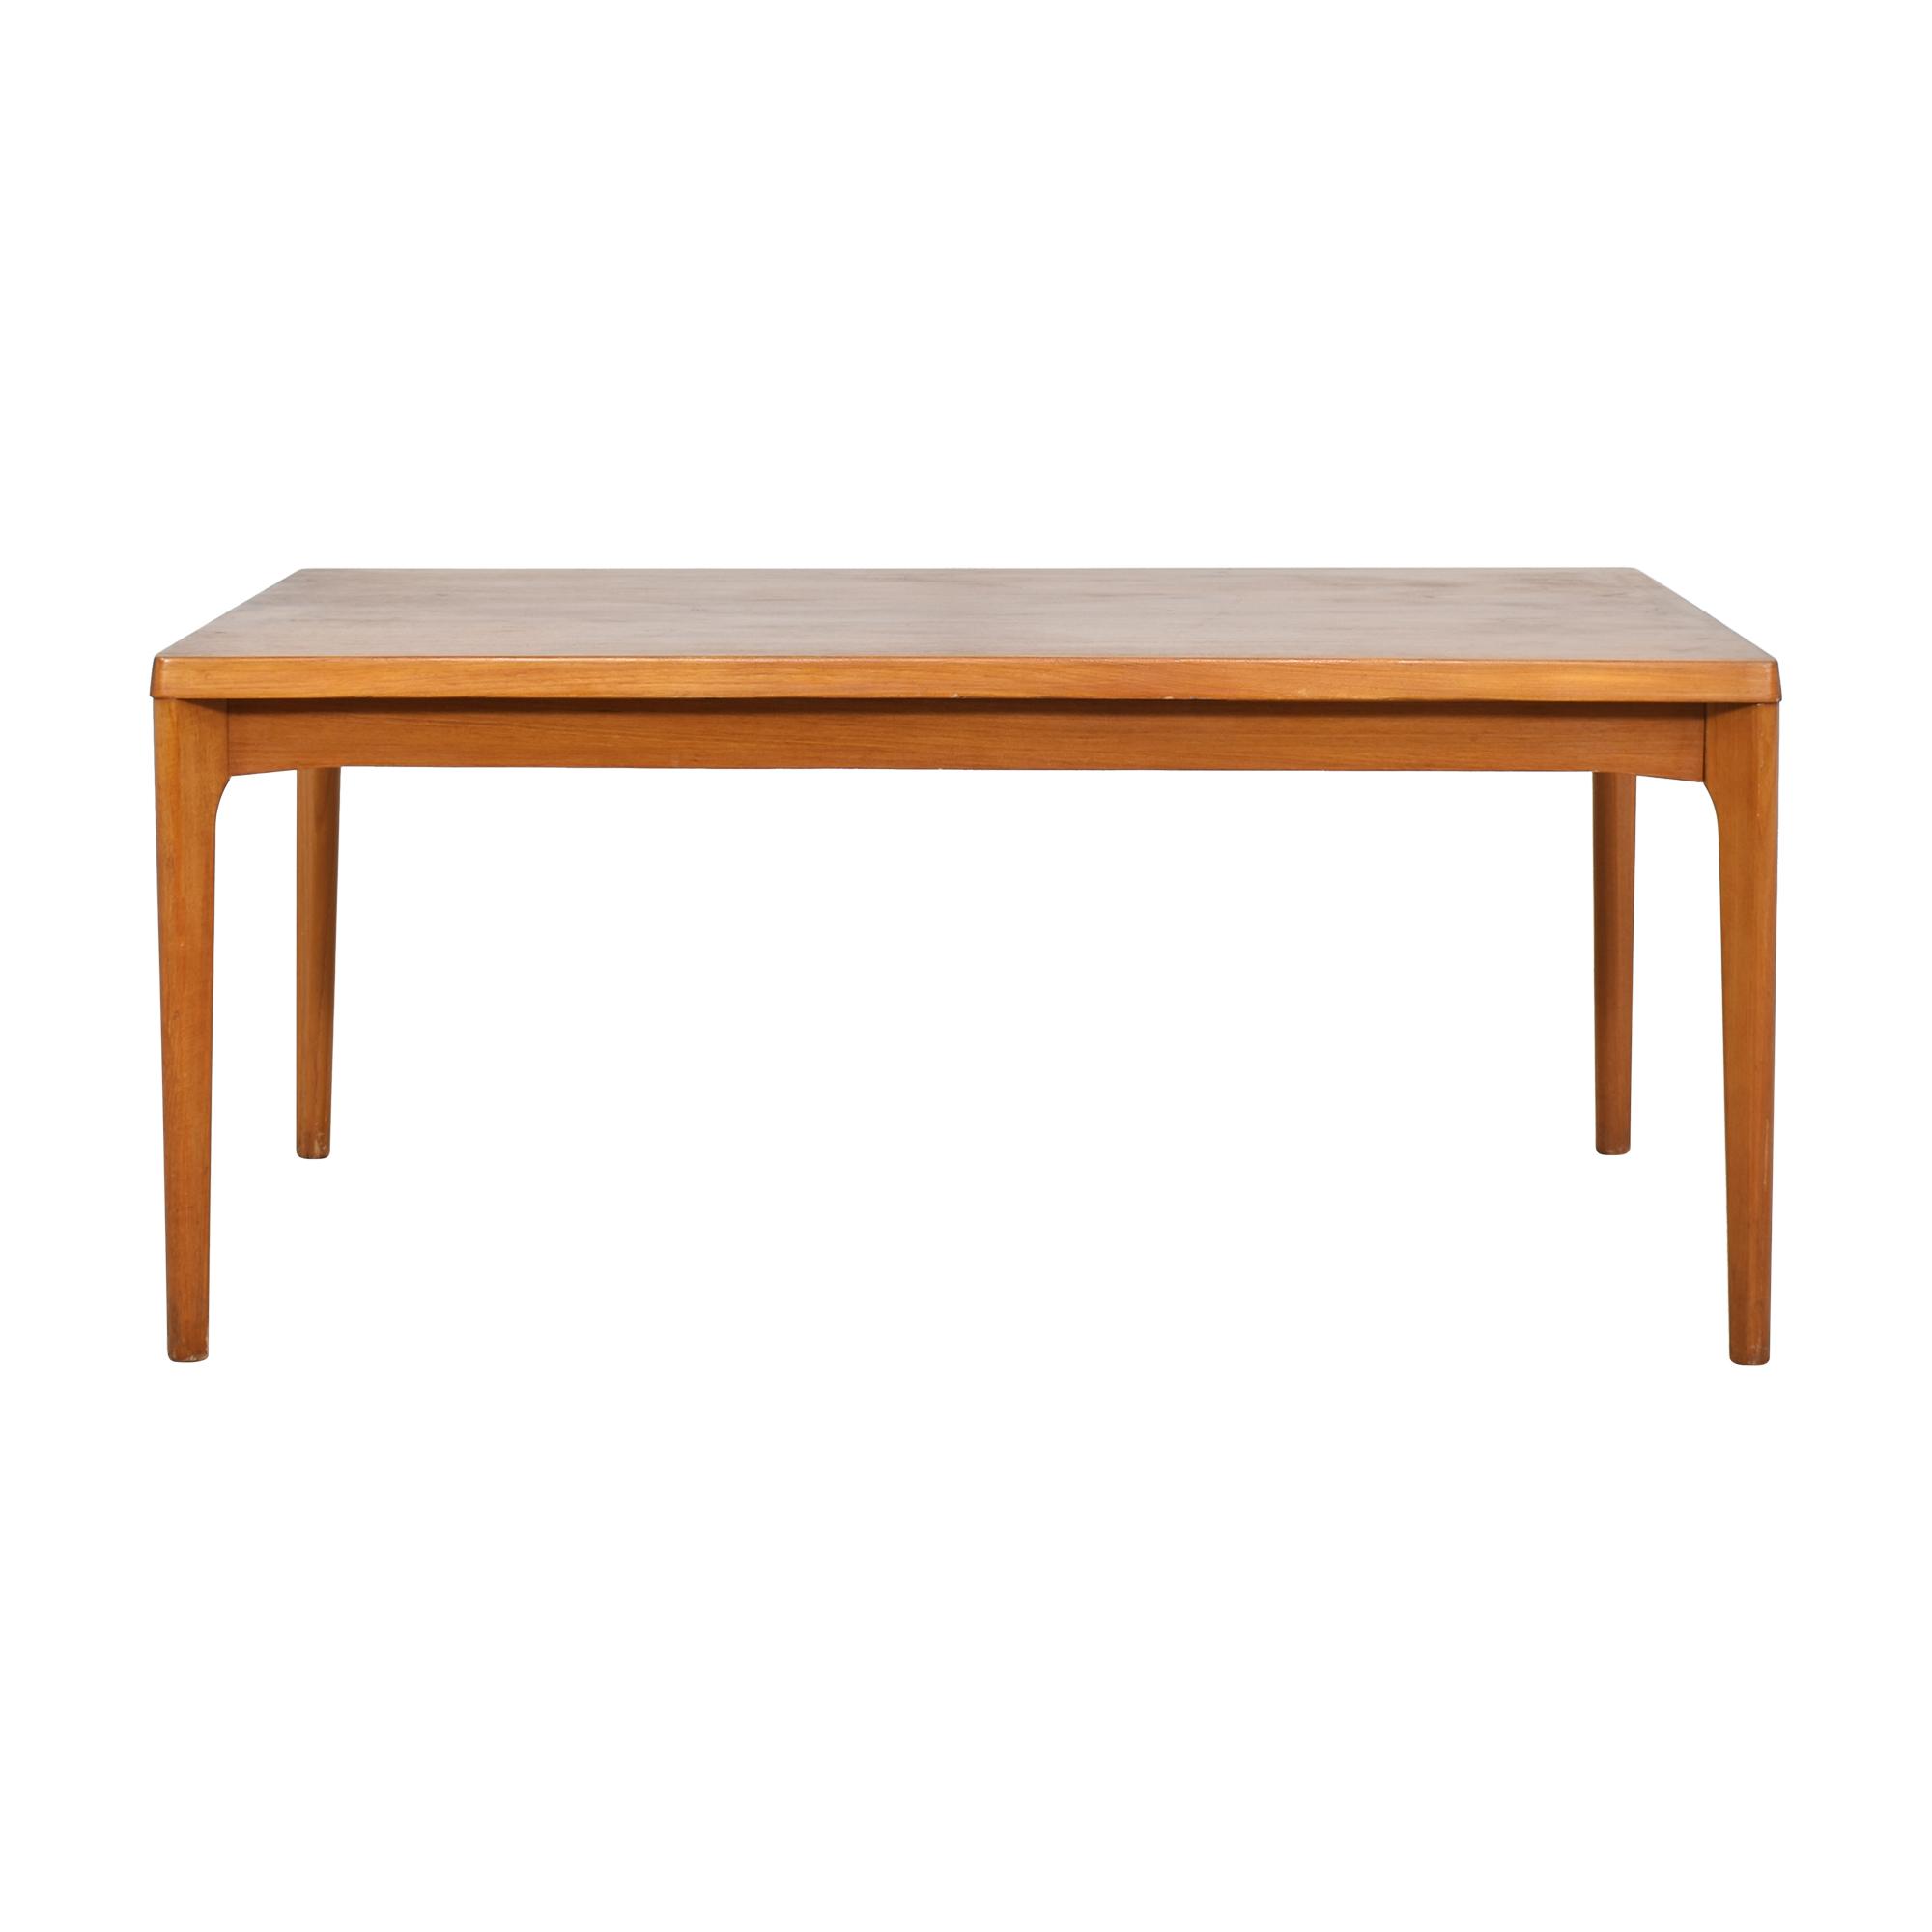 Danish-Style Modern Extending Dining Table